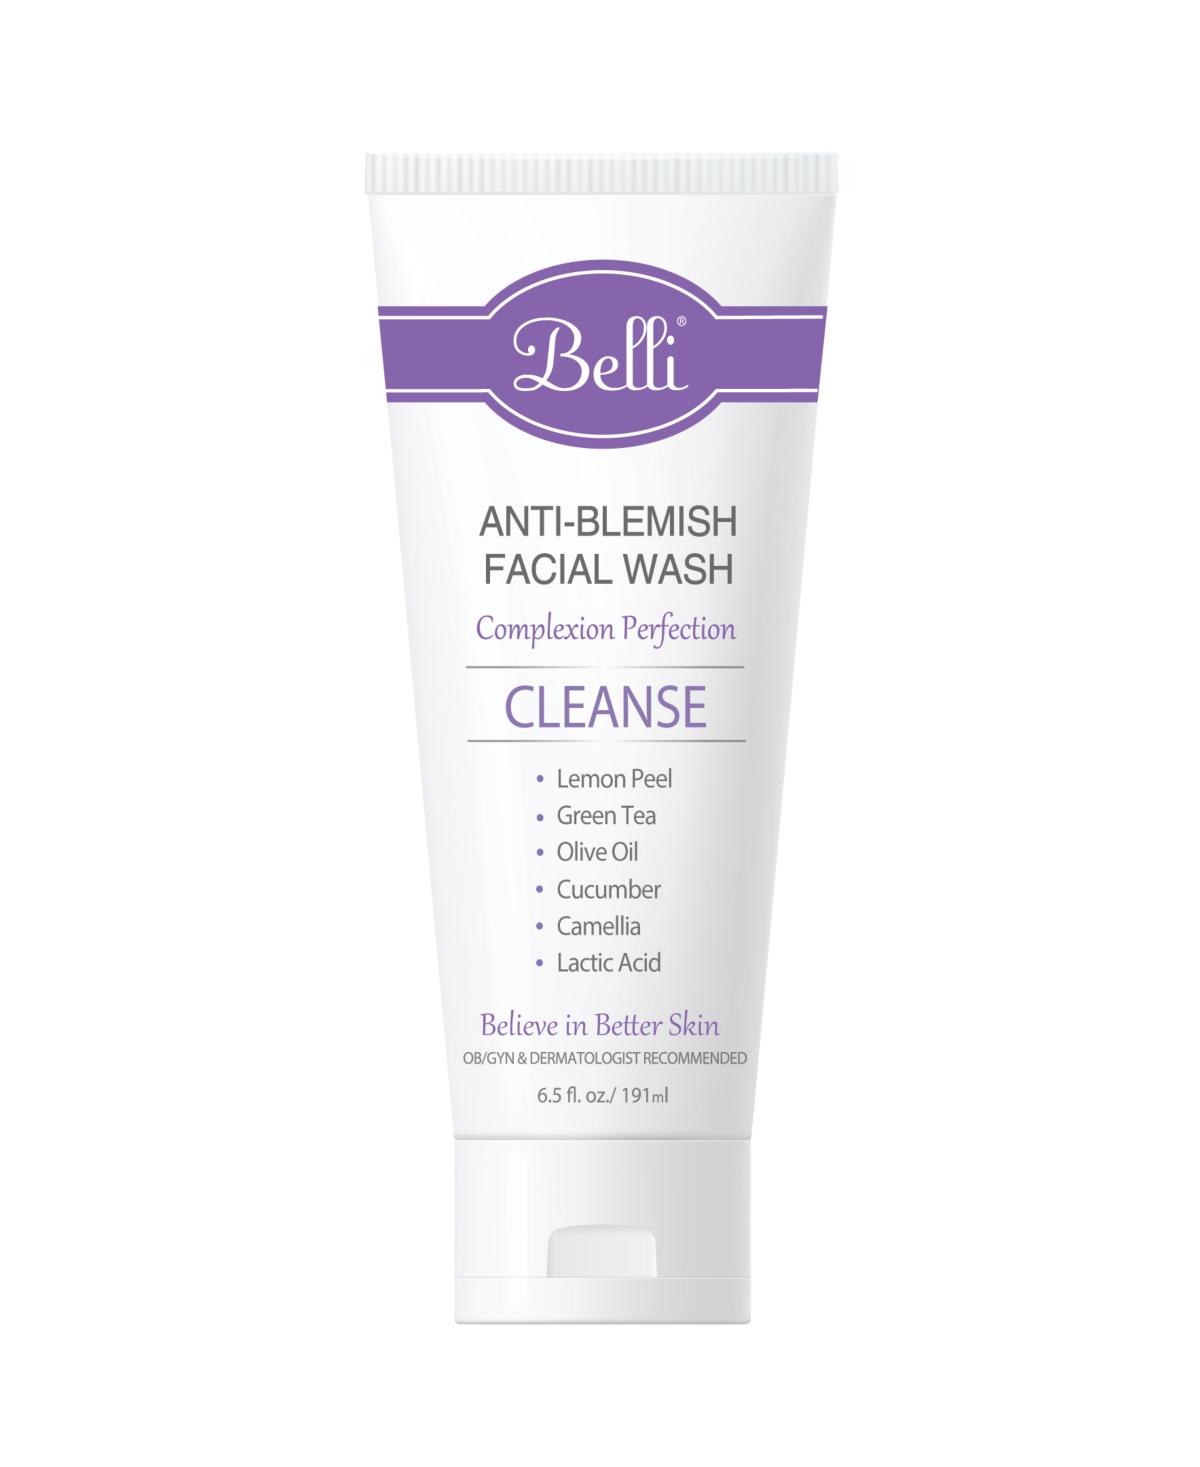 Belli Skin Care Anti-Blemish Facial Wash, 6.5 fl oz